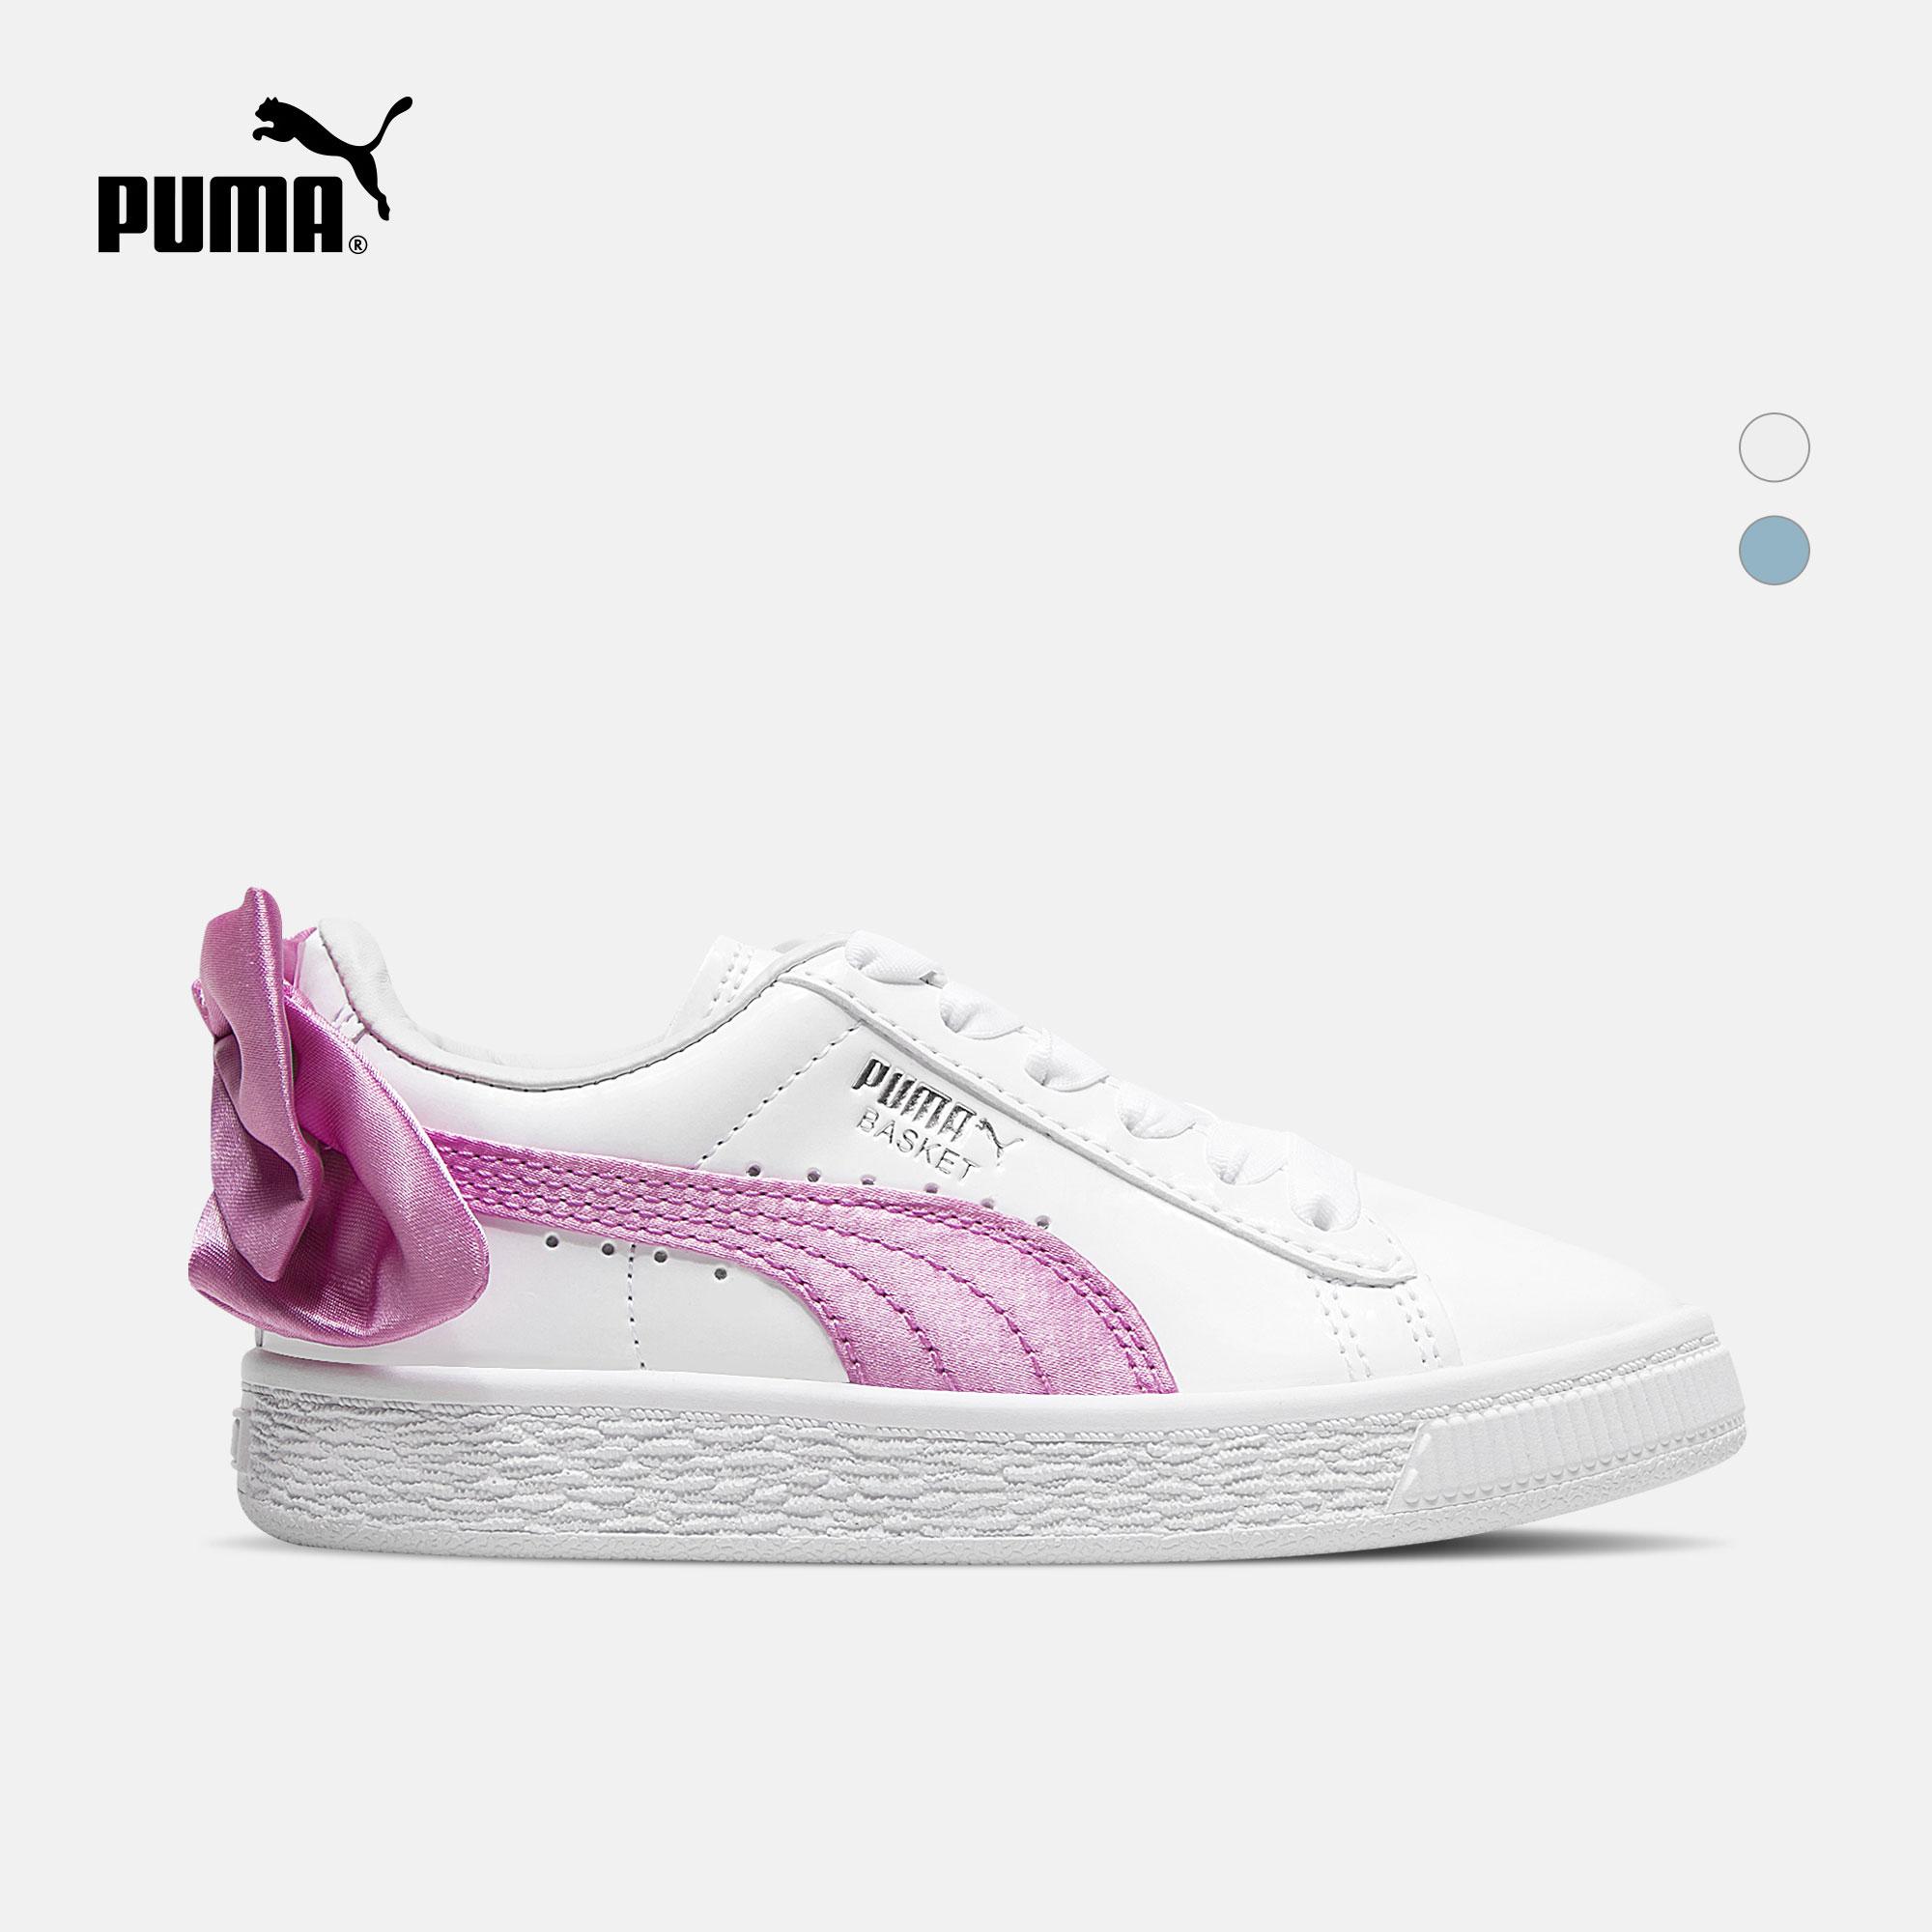 PUMA彪马官方 儿童蝴蝶结休闲鞋 Basket Bow Patent 367622